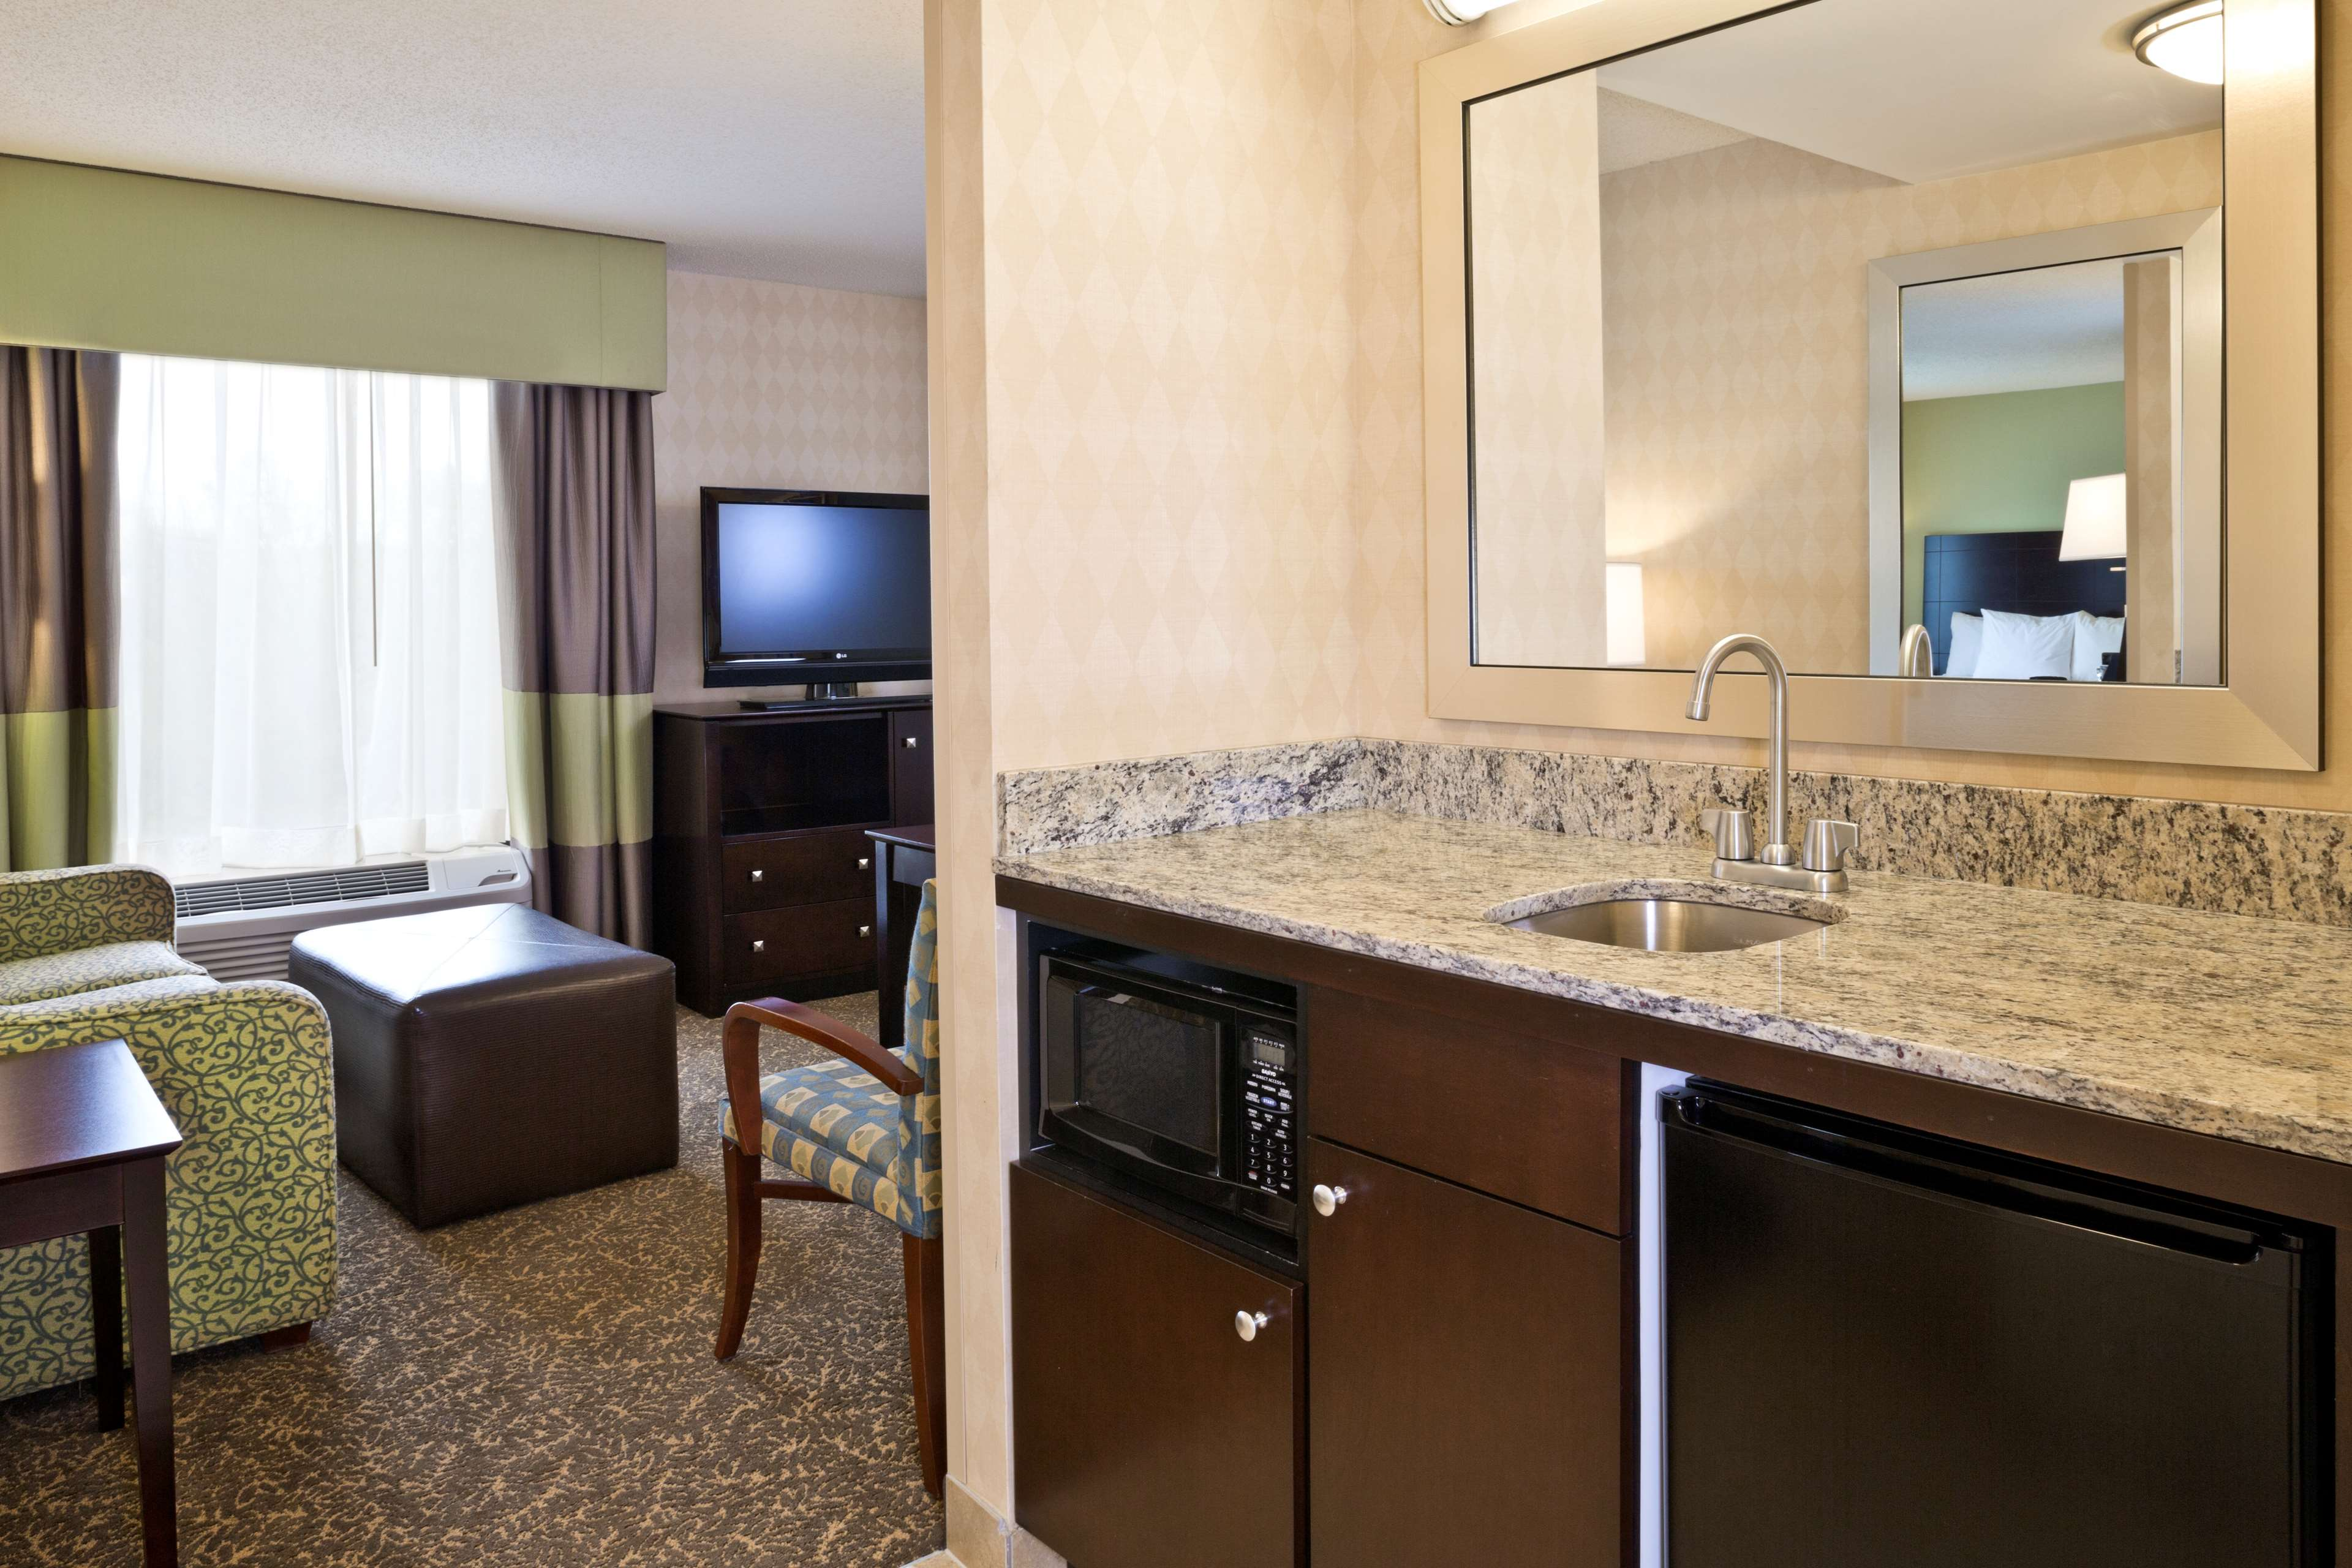 Hampton Inn & Suites Arundel Mills/Baltimore image 15